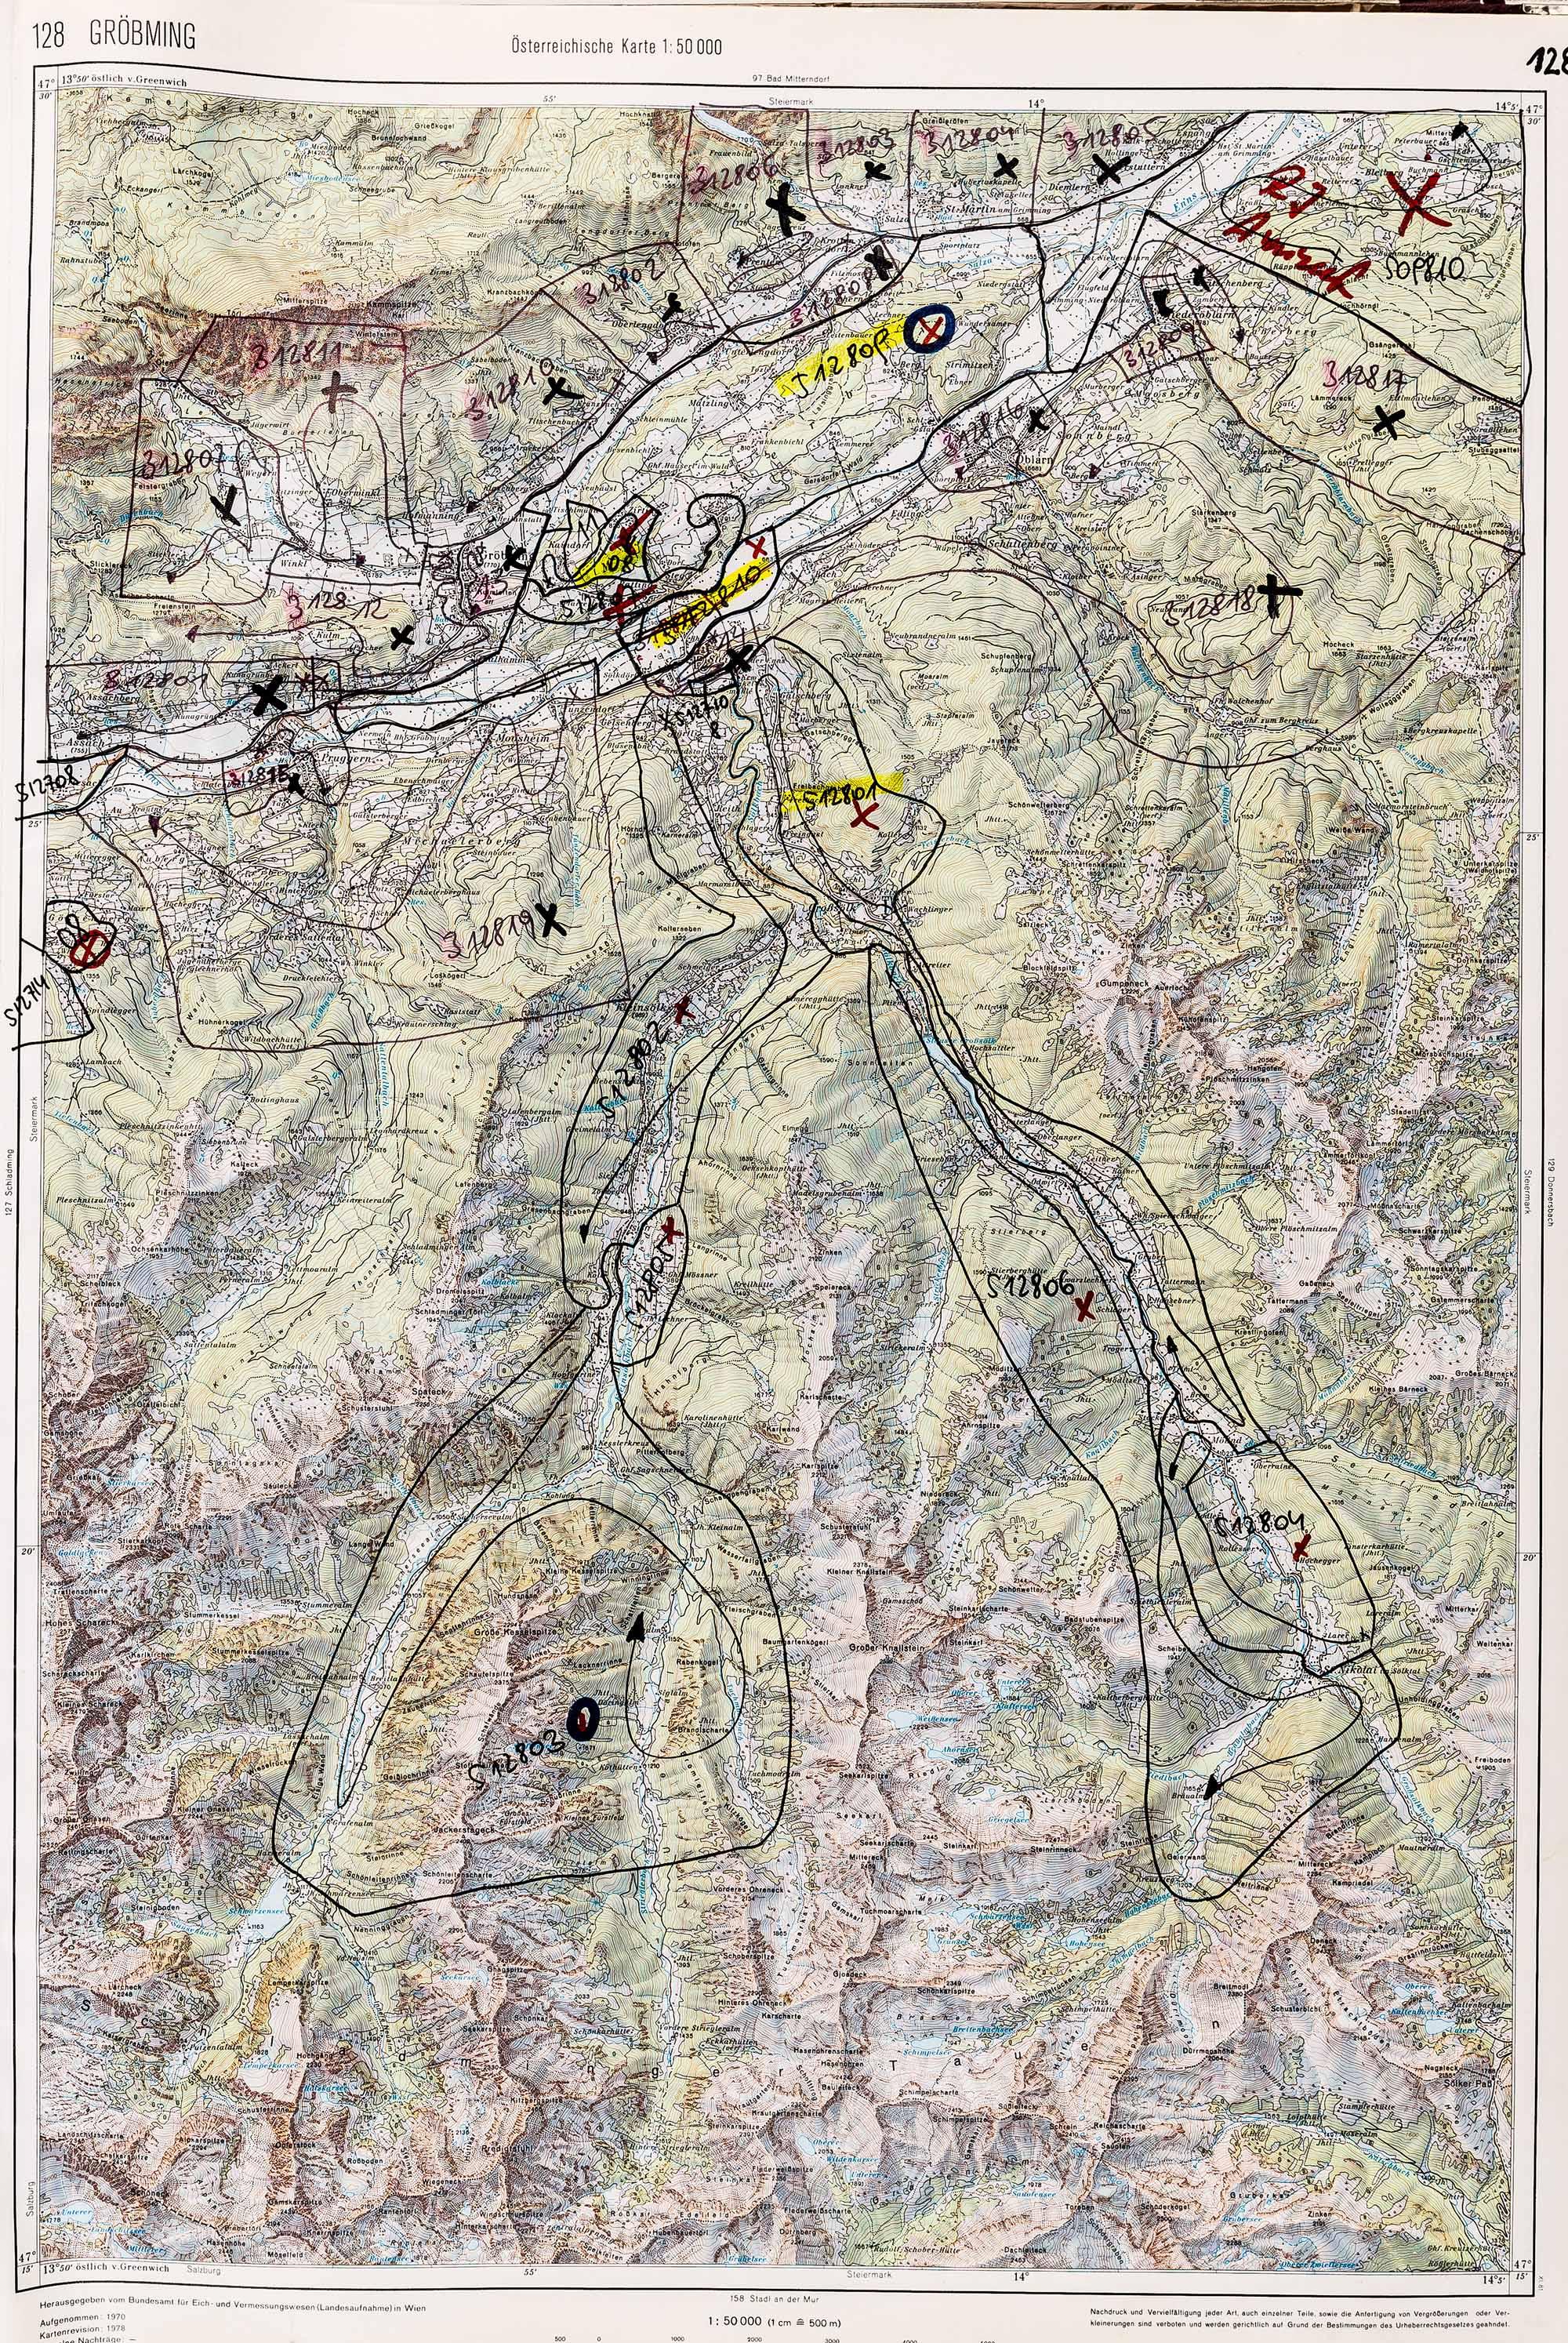 1983-1986 Karte 128